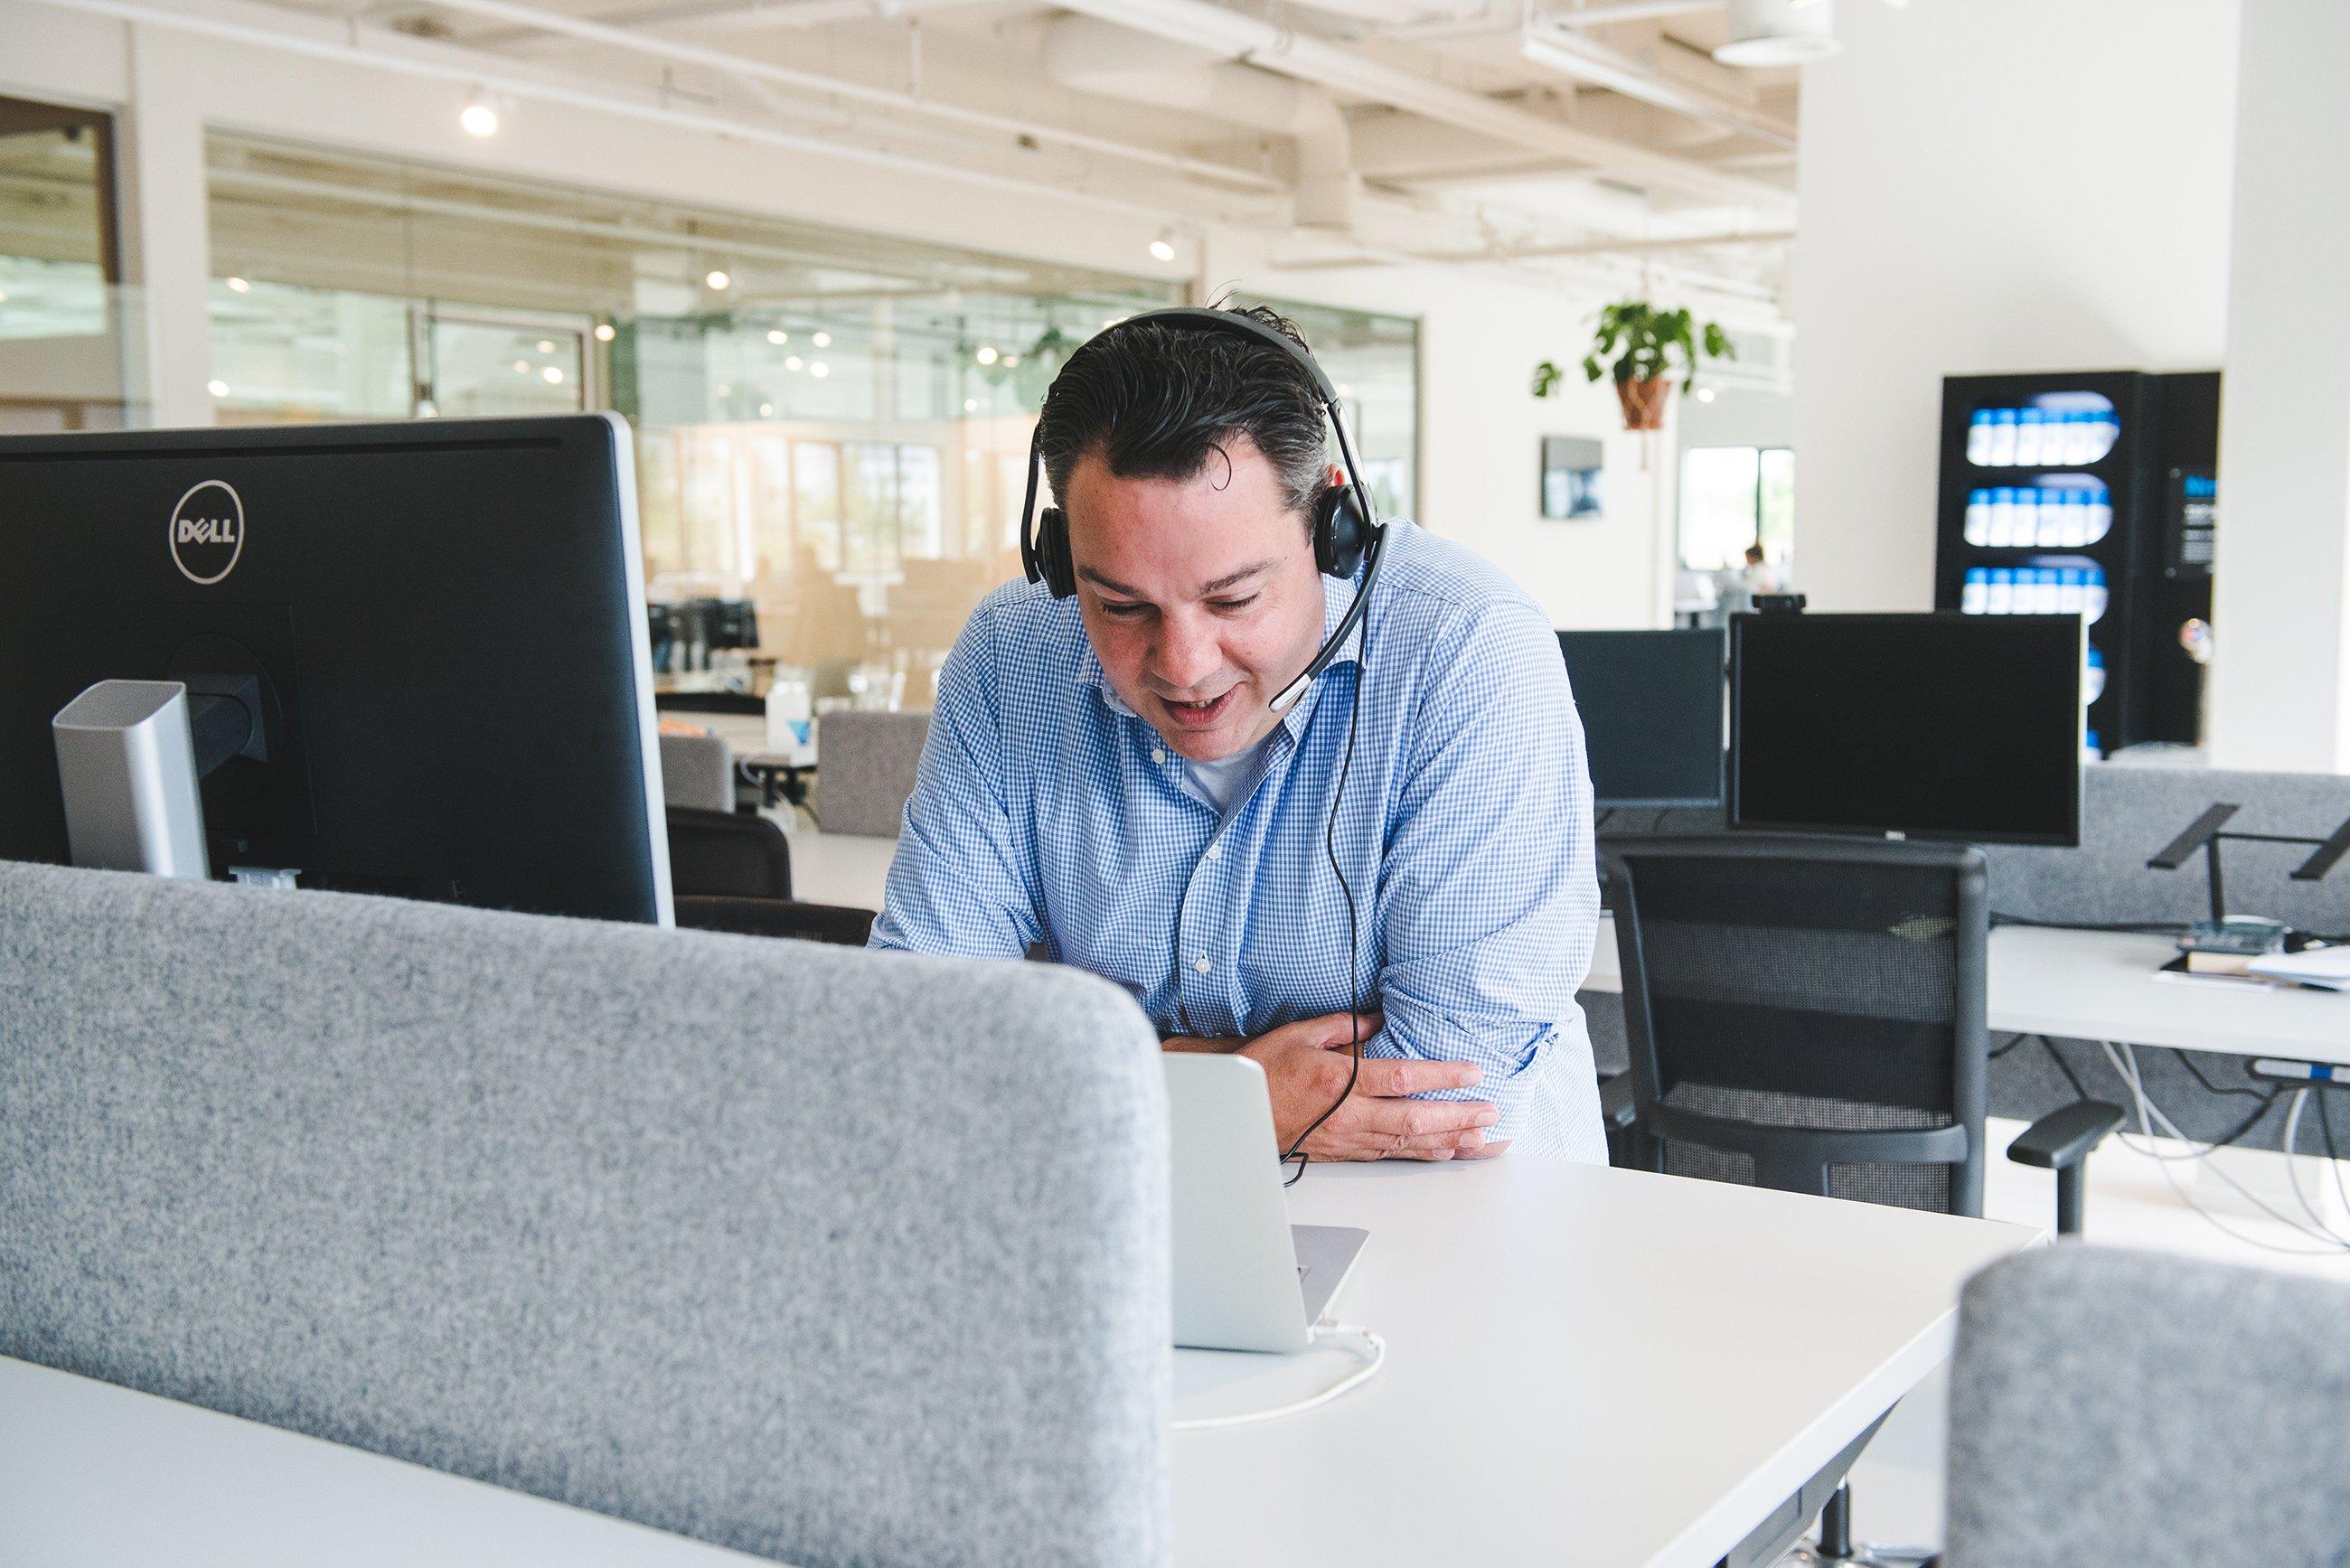 nmbrs-career-website-careers-hiring-process-final-interview